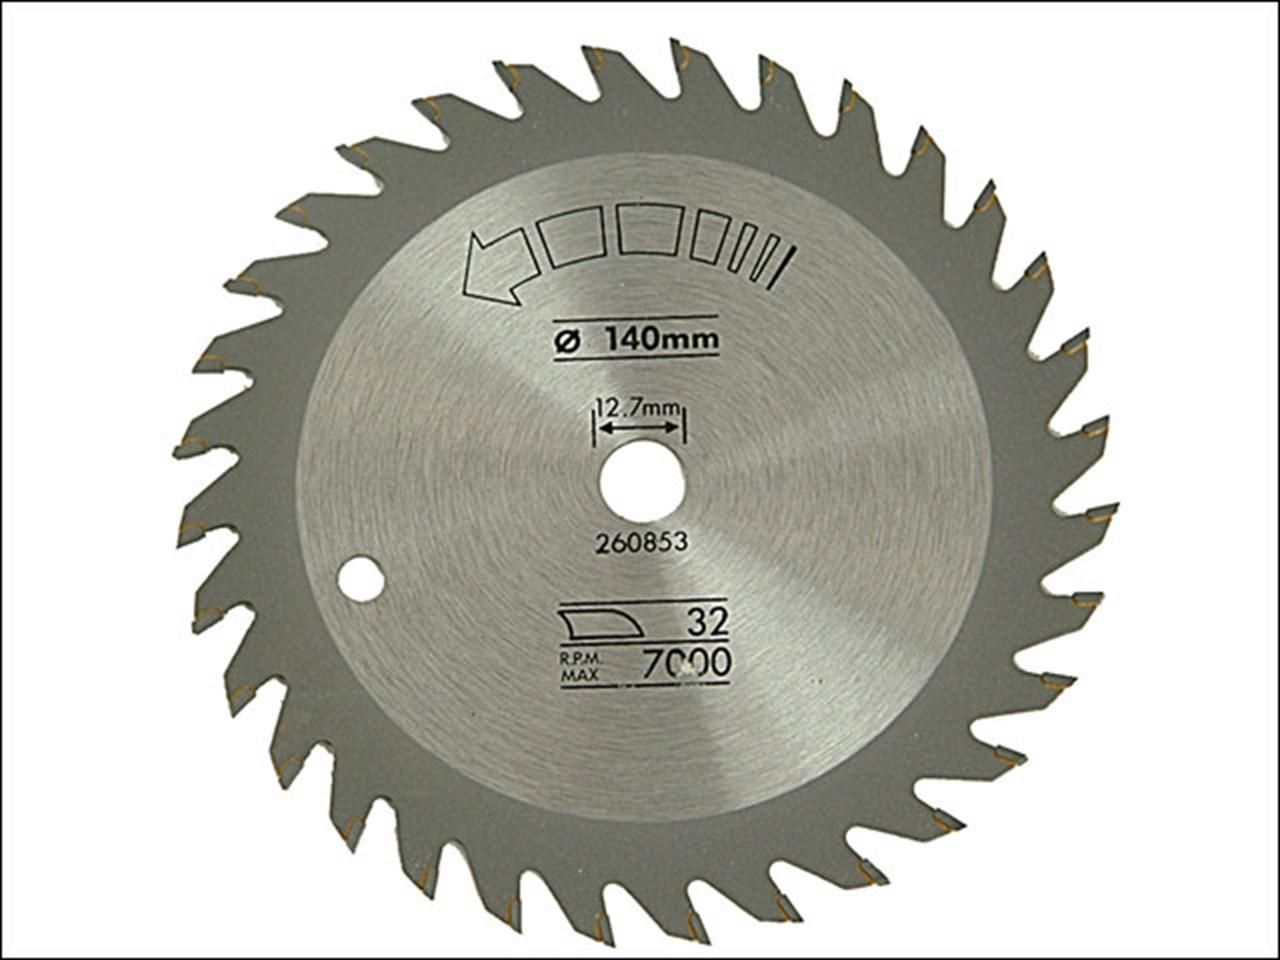 Black decker x13005 circular saw blade rip 140 x 127 x 32t greentooth Image collections